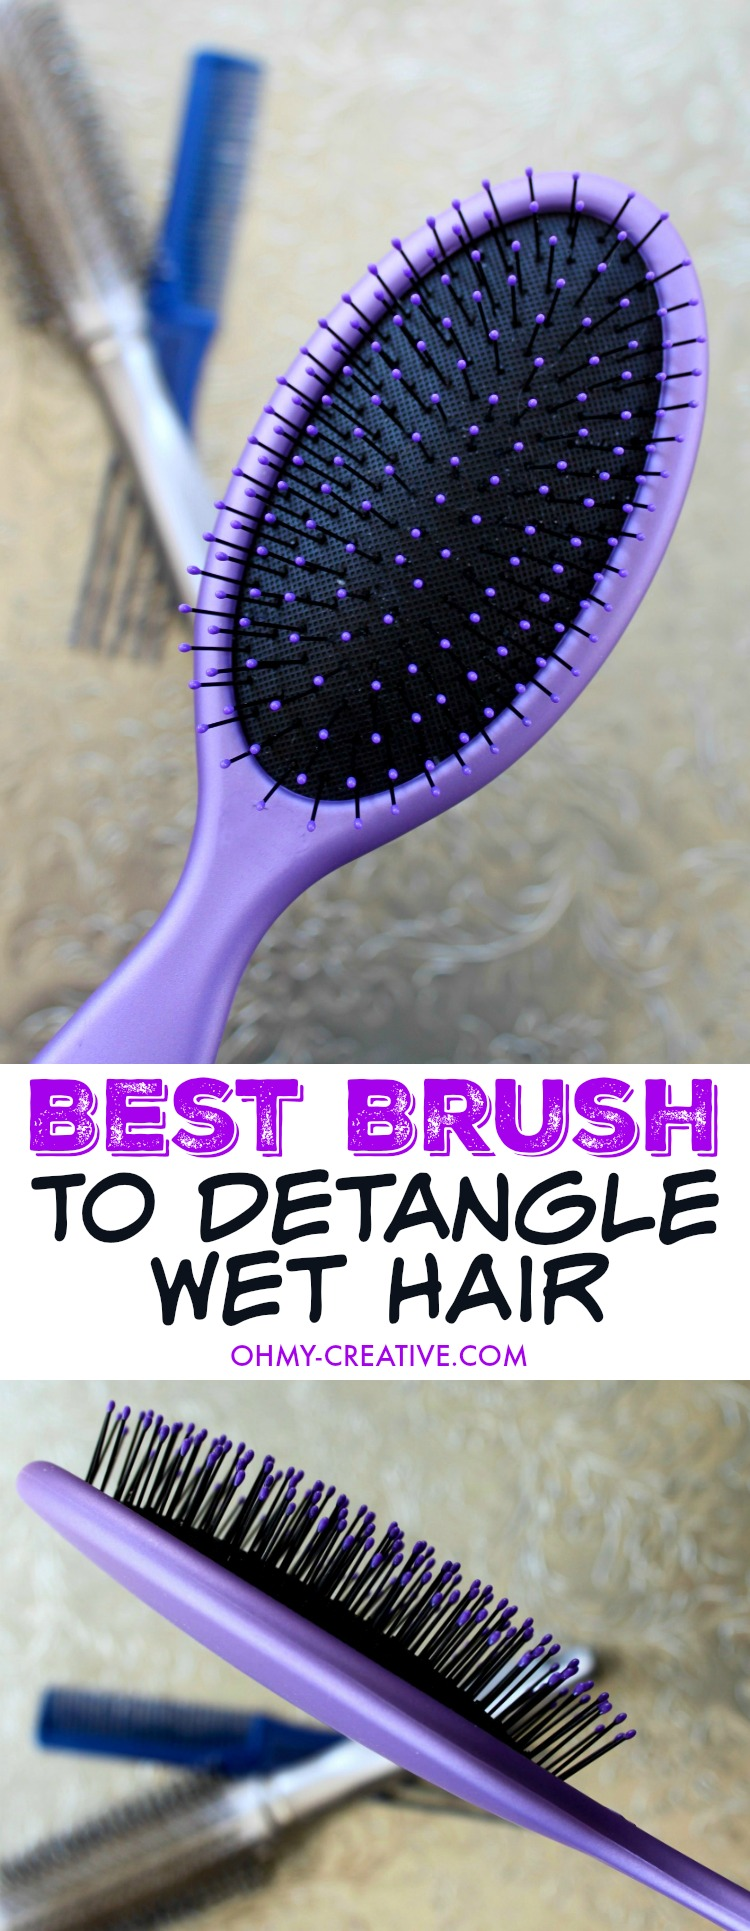 The Best Brush to Detangle Wet Hair - a hairbrush that doesn't hurt